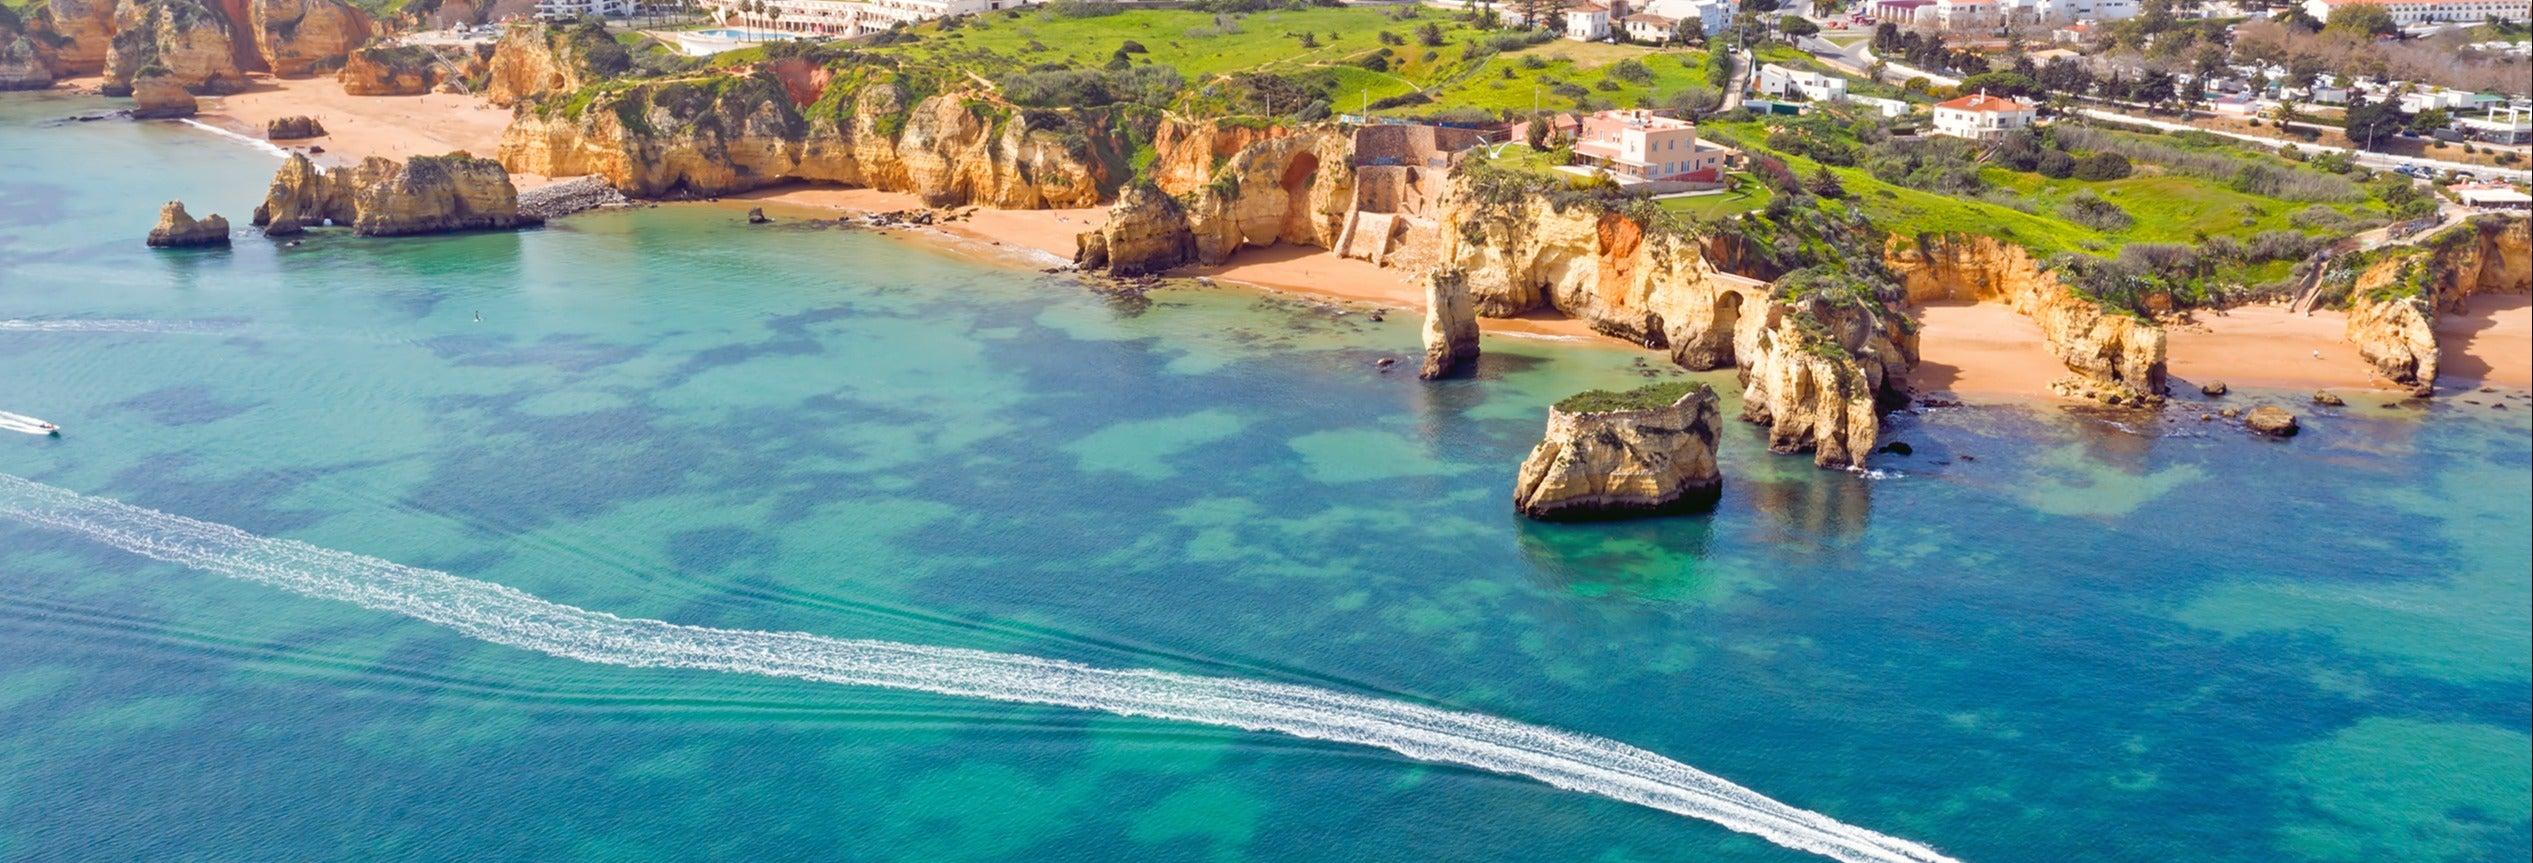 Experiência Jet Boat em Lagos